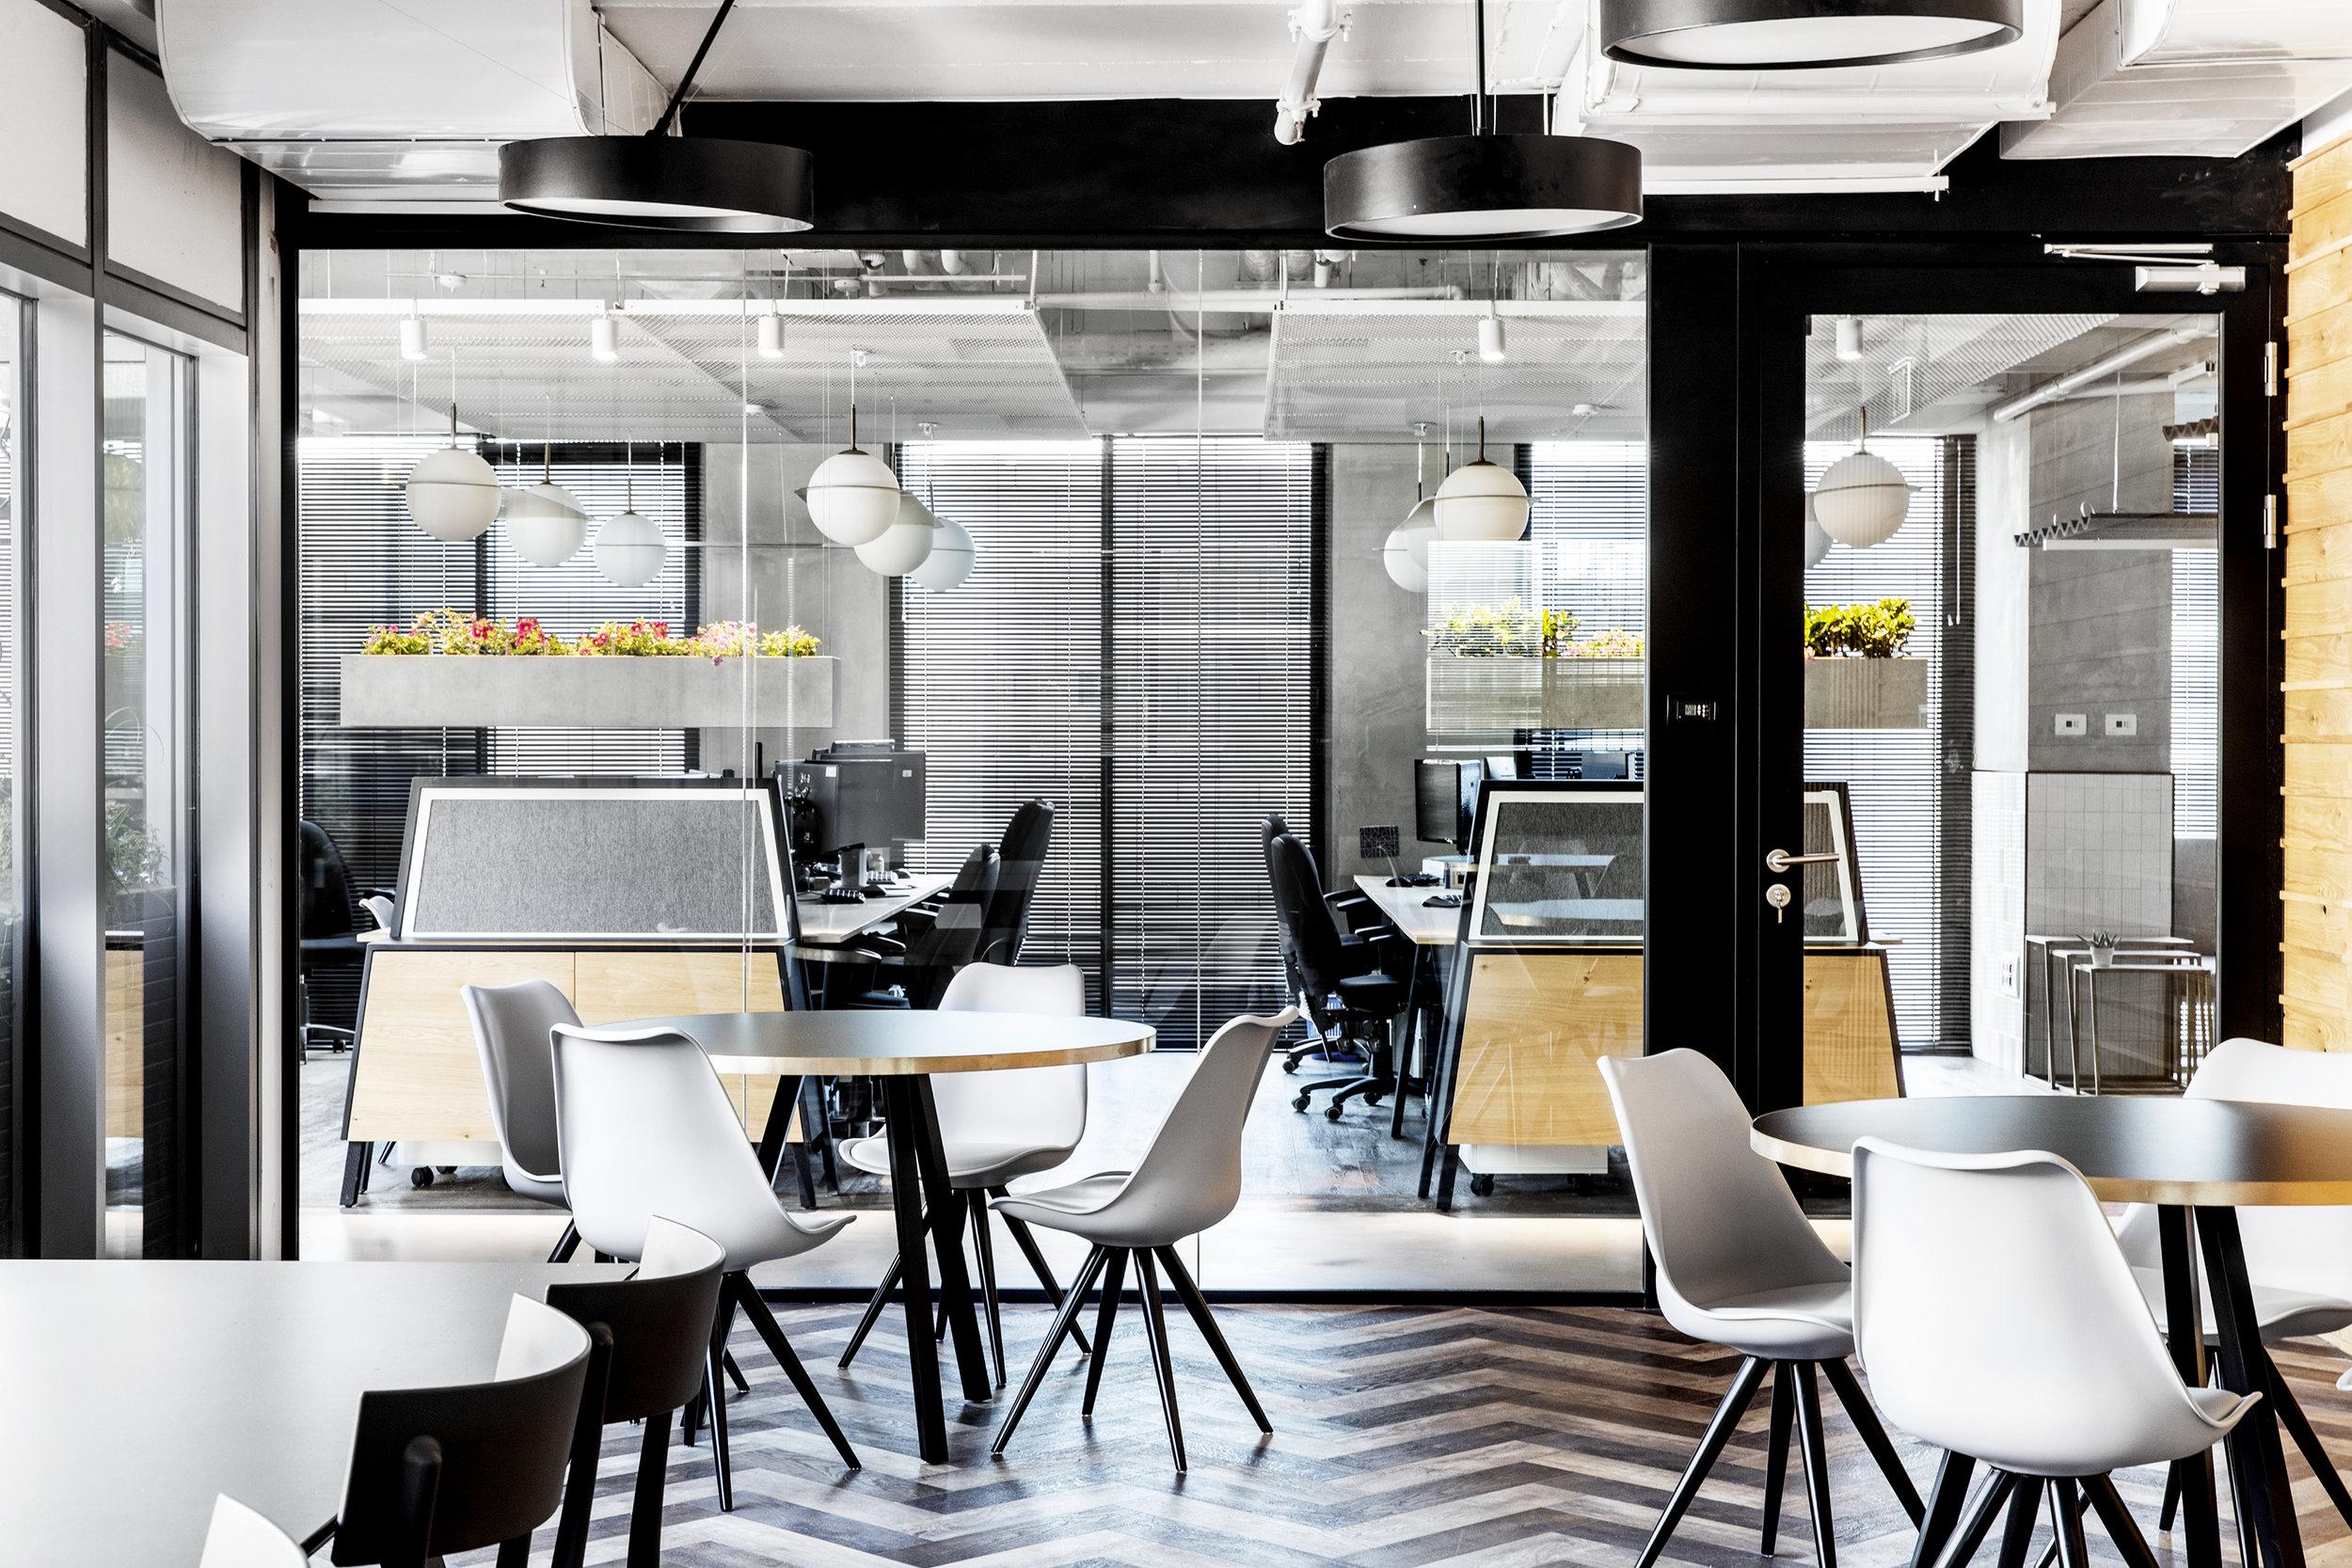 R2NET OFFICES - ROY DAVID ARCHITECTURE  STUDIO - רואי דוד אדריכלות סטודיו אדריכלים - אר2נט (25).jpg